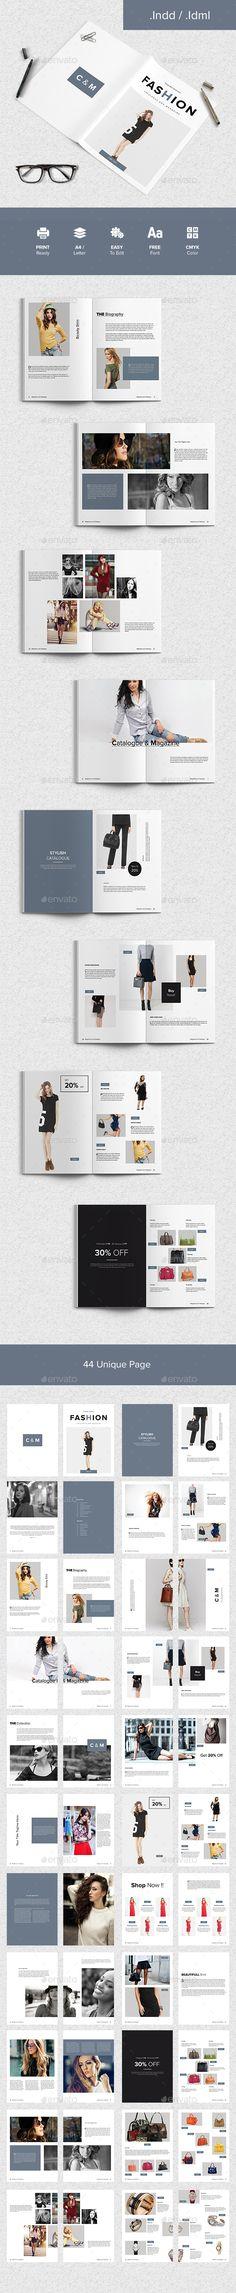 Fashion Catalogue & Magazine by suavedigital A clean, modern, minimalistic template that is suitable for magazines, catalogs, portfolio etc. Detail description of this item is